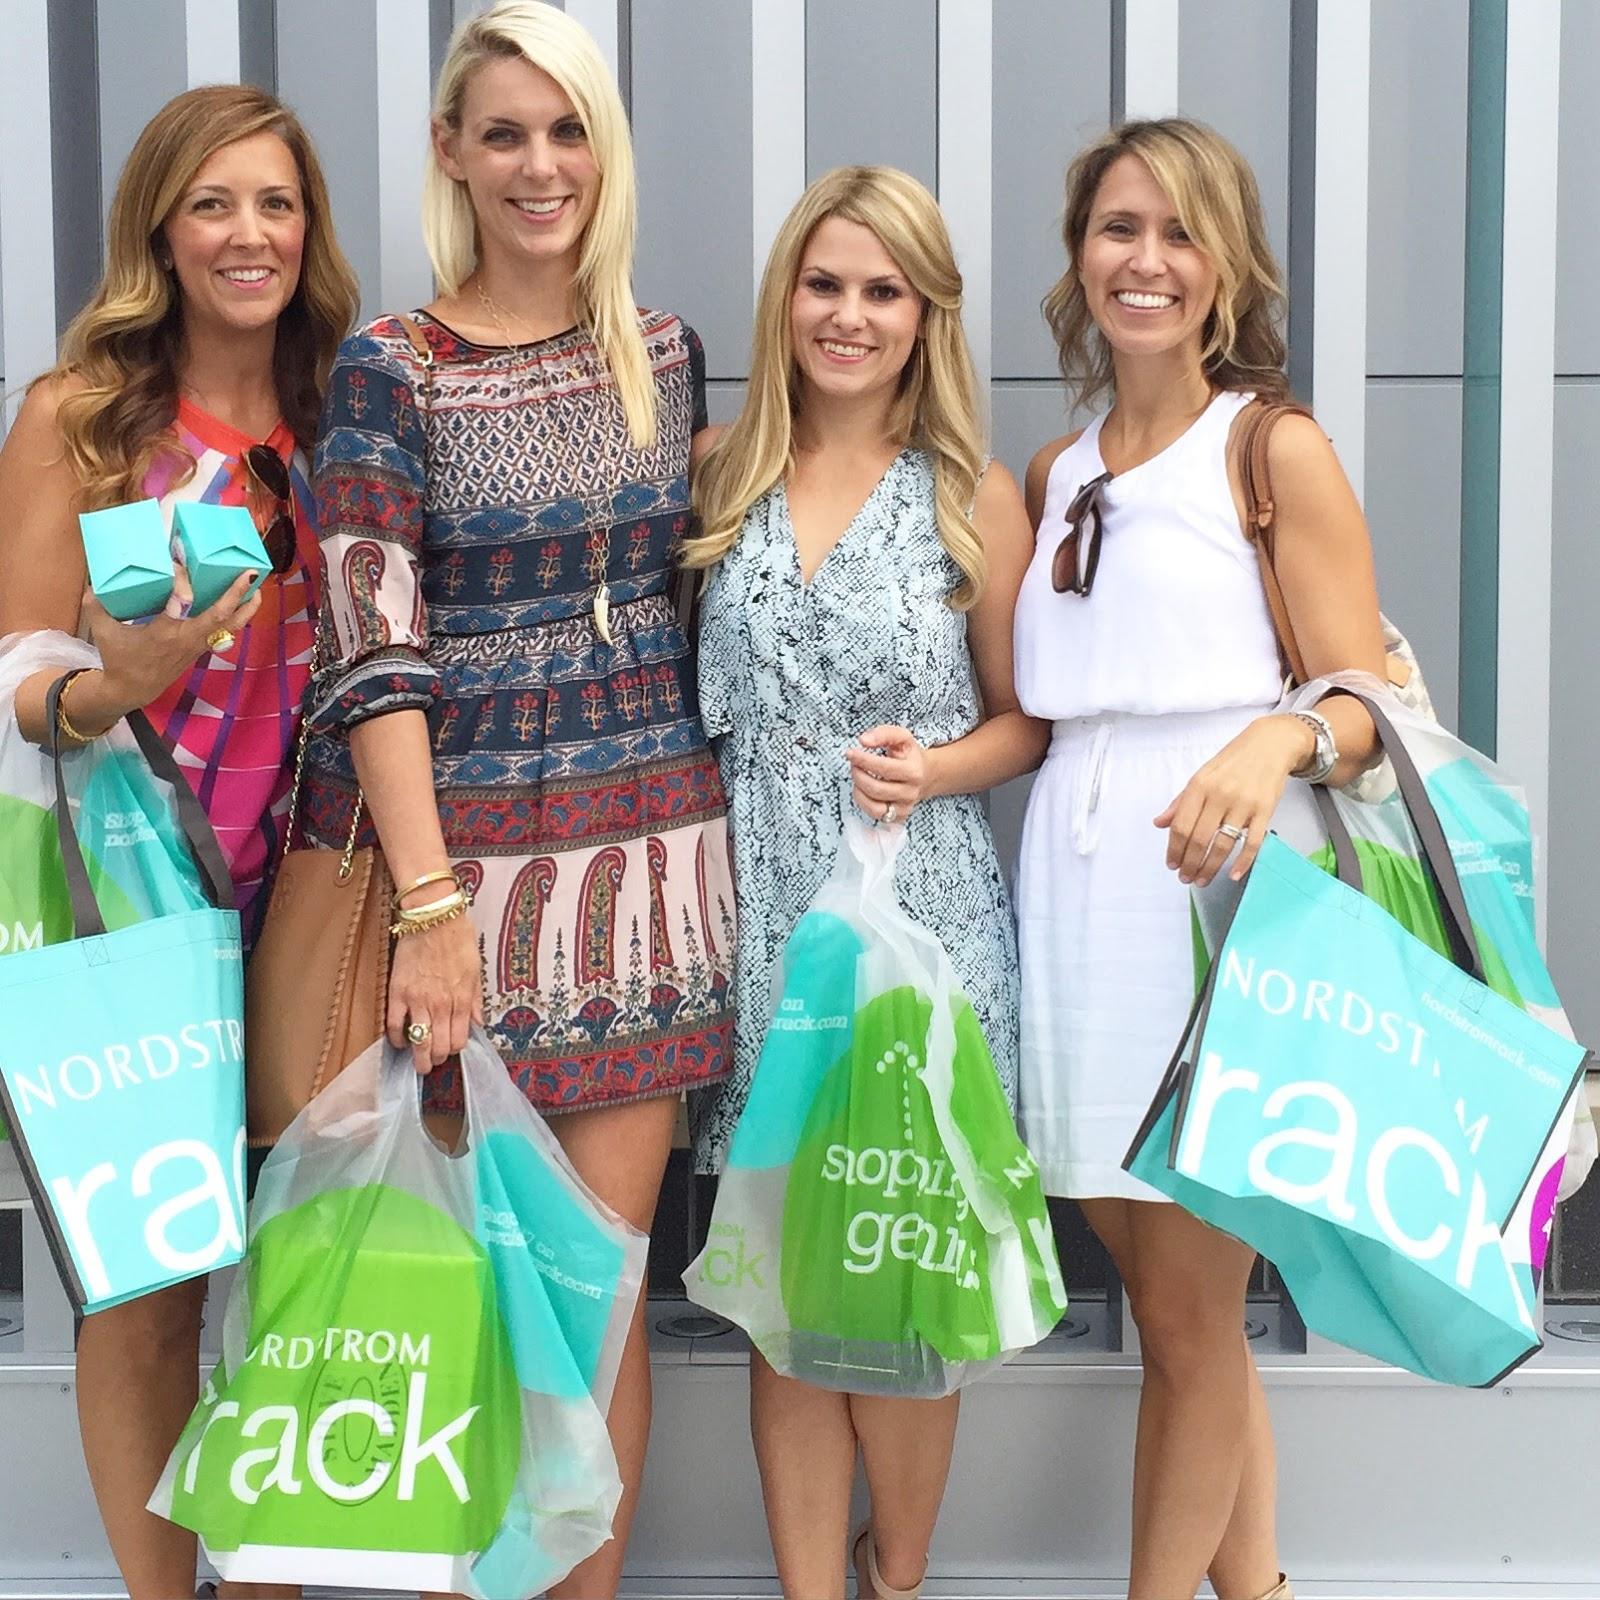 1c212b8f4ec1 Nordstrom Rack Finds - Designer Bags & Dirty Diapers